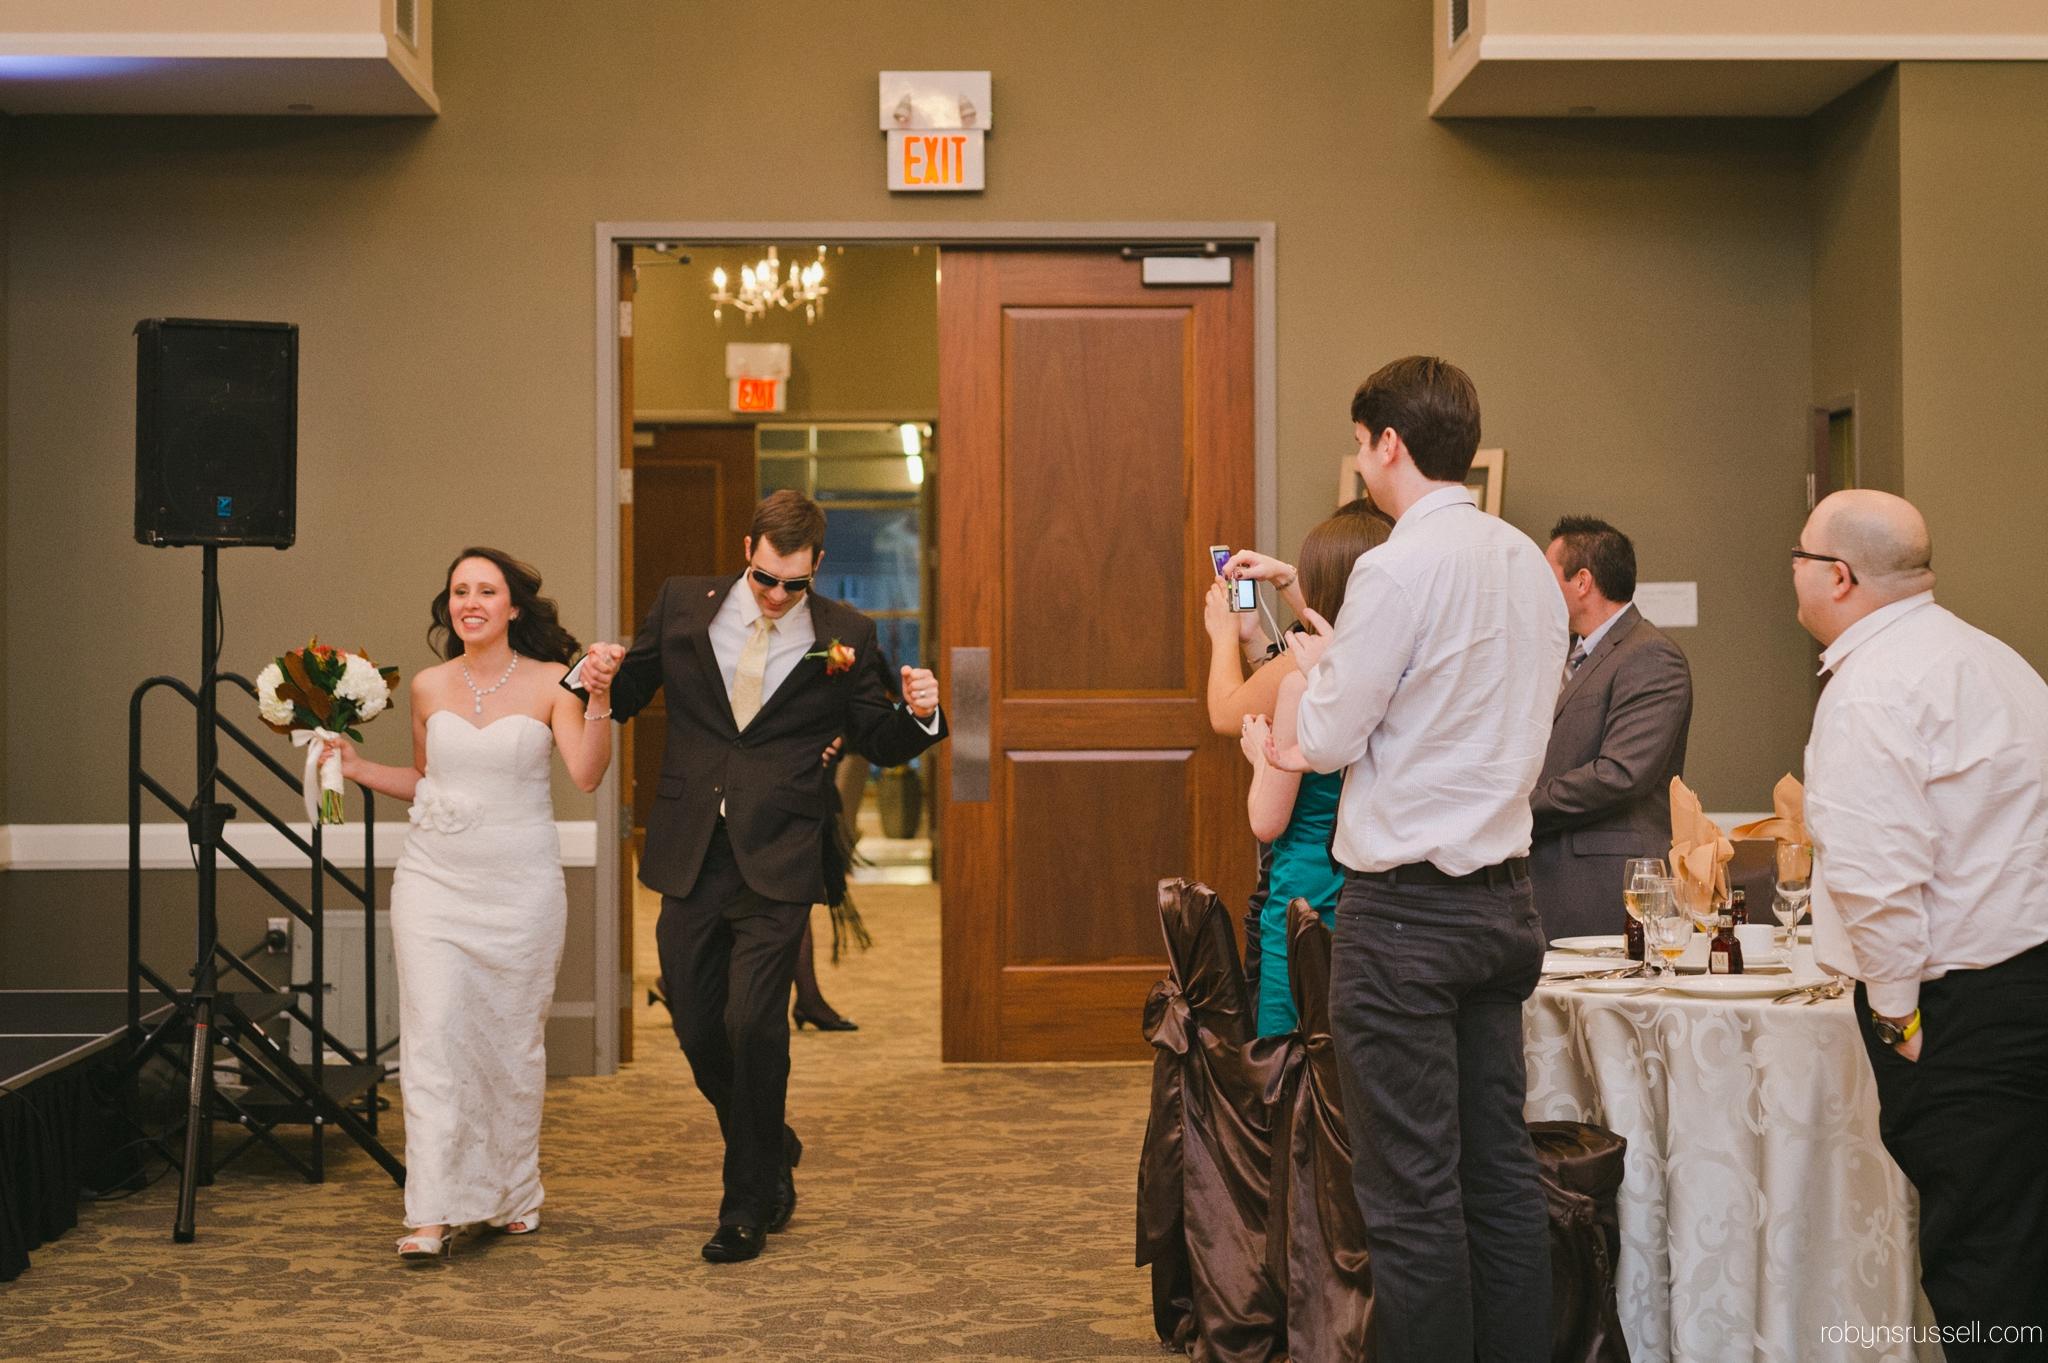 51-husband-and-wife-entrance.jpg